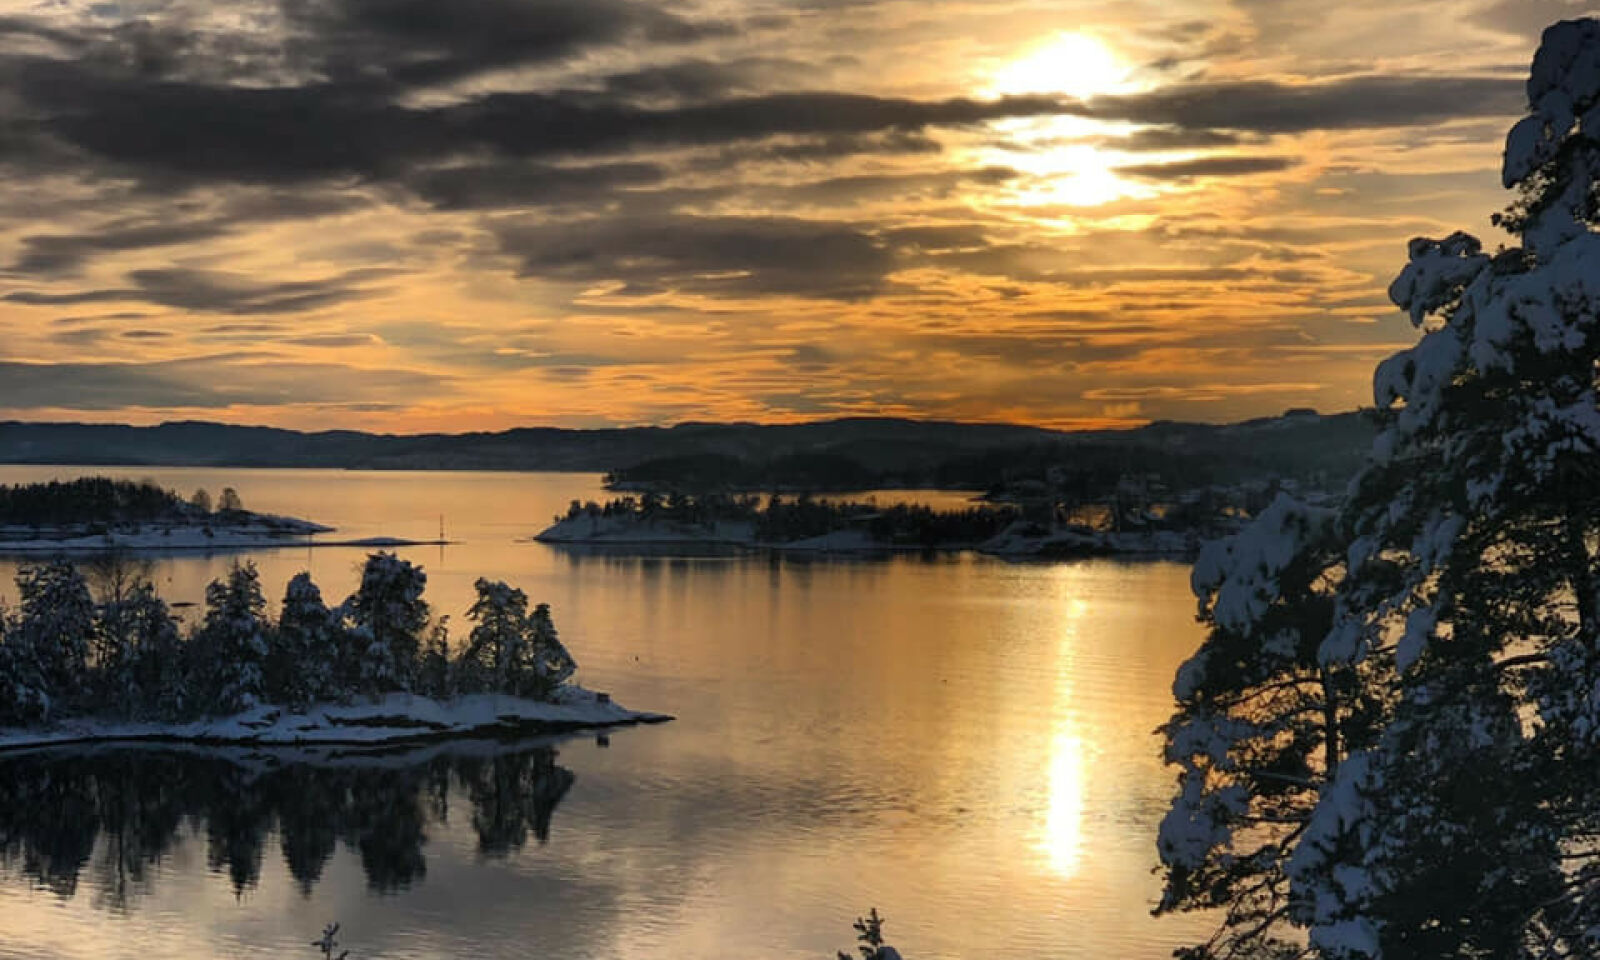 Foto: Per Olav Apalnes